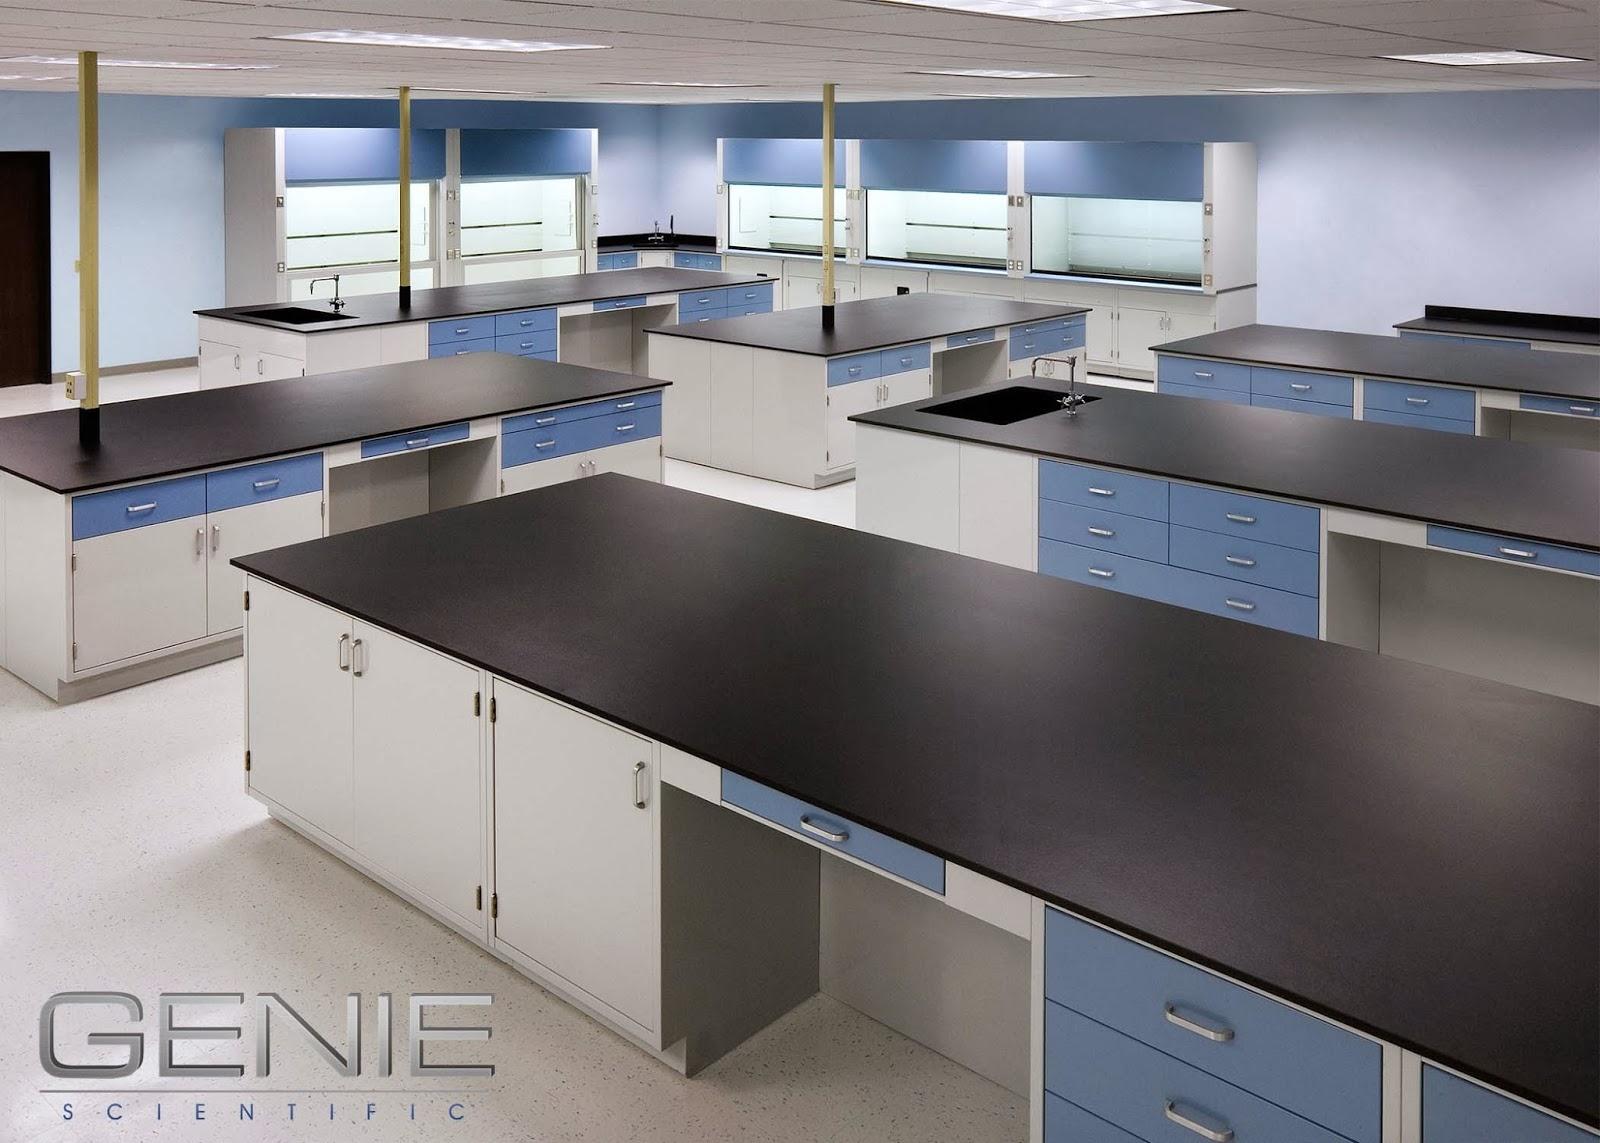 Countertop Material Used In Science Labs : Genie Scientific has been fabricating custom laboratory countertops ...